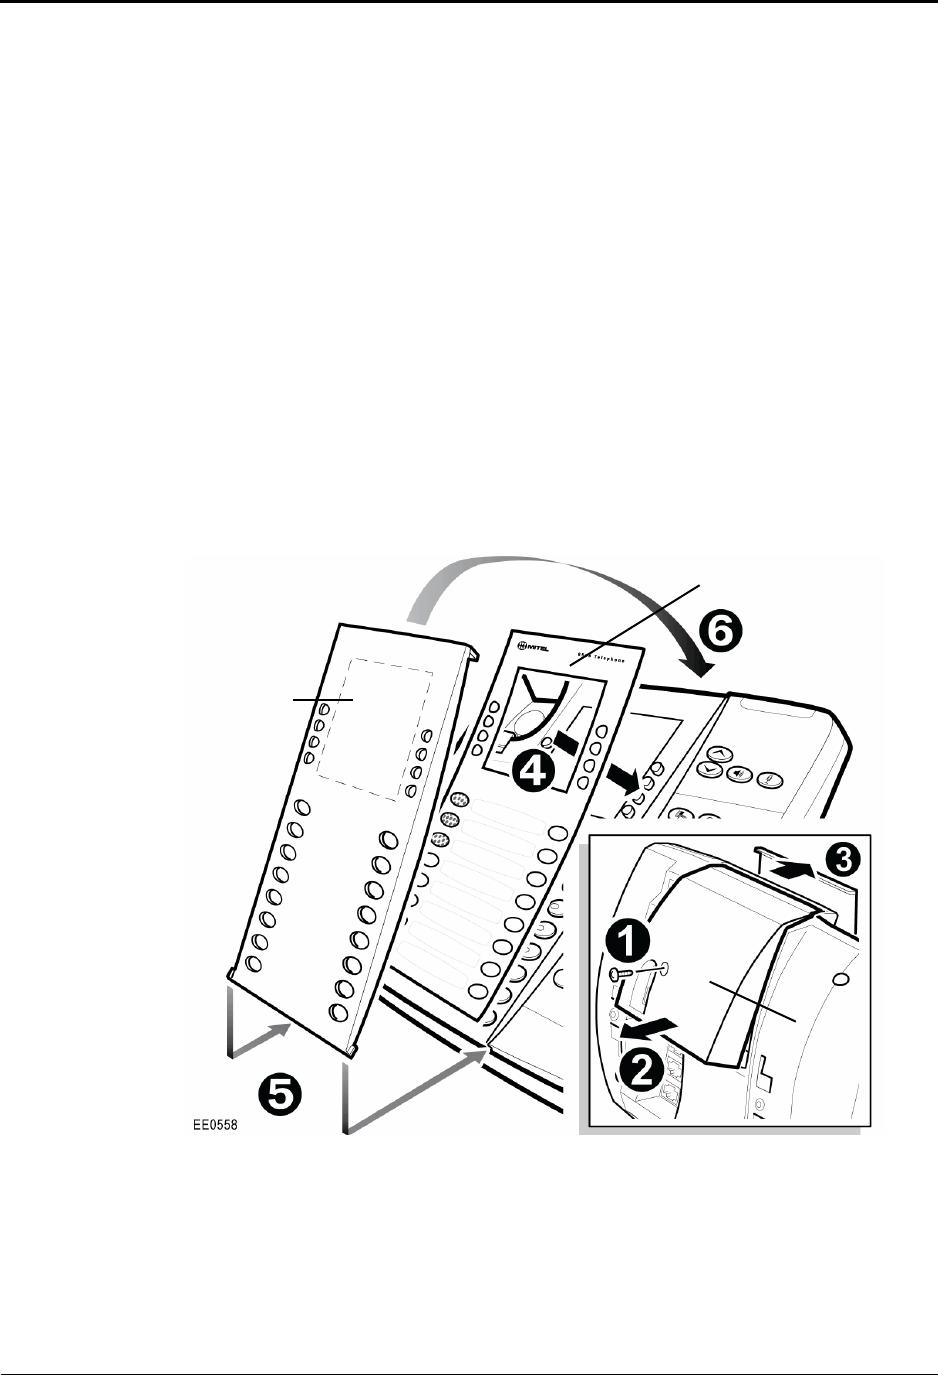 Mitel 8568 Users Manual Telephone User Guide